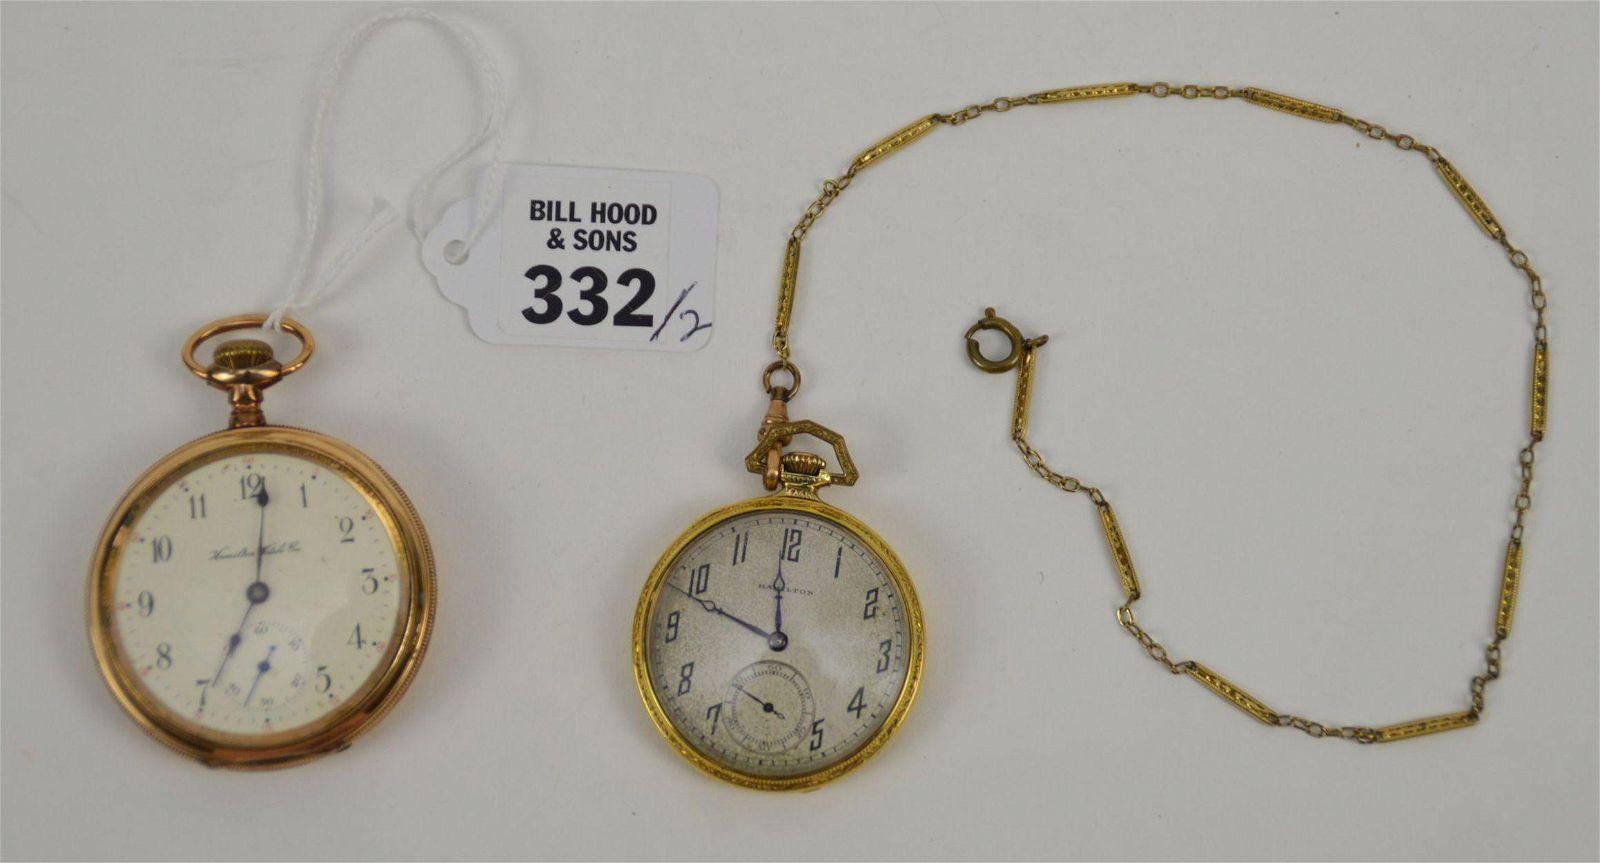 2 Hamilton Gold Filled Pocket Watches. Hamilton Watch